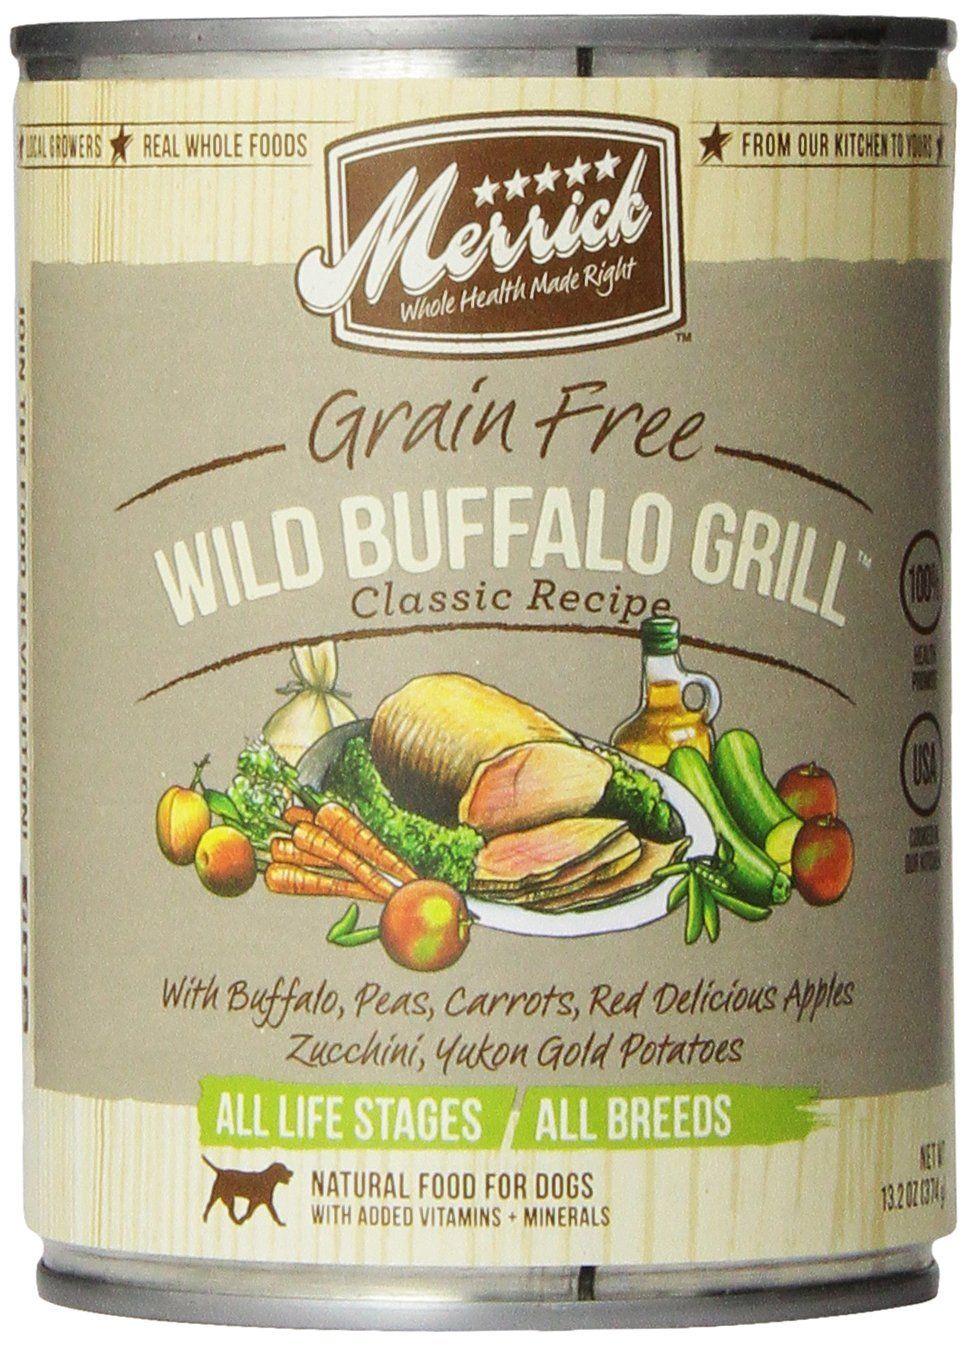 Merrick Wild Buffalo Grill Dog Food 13.2 oz (12 Count Case